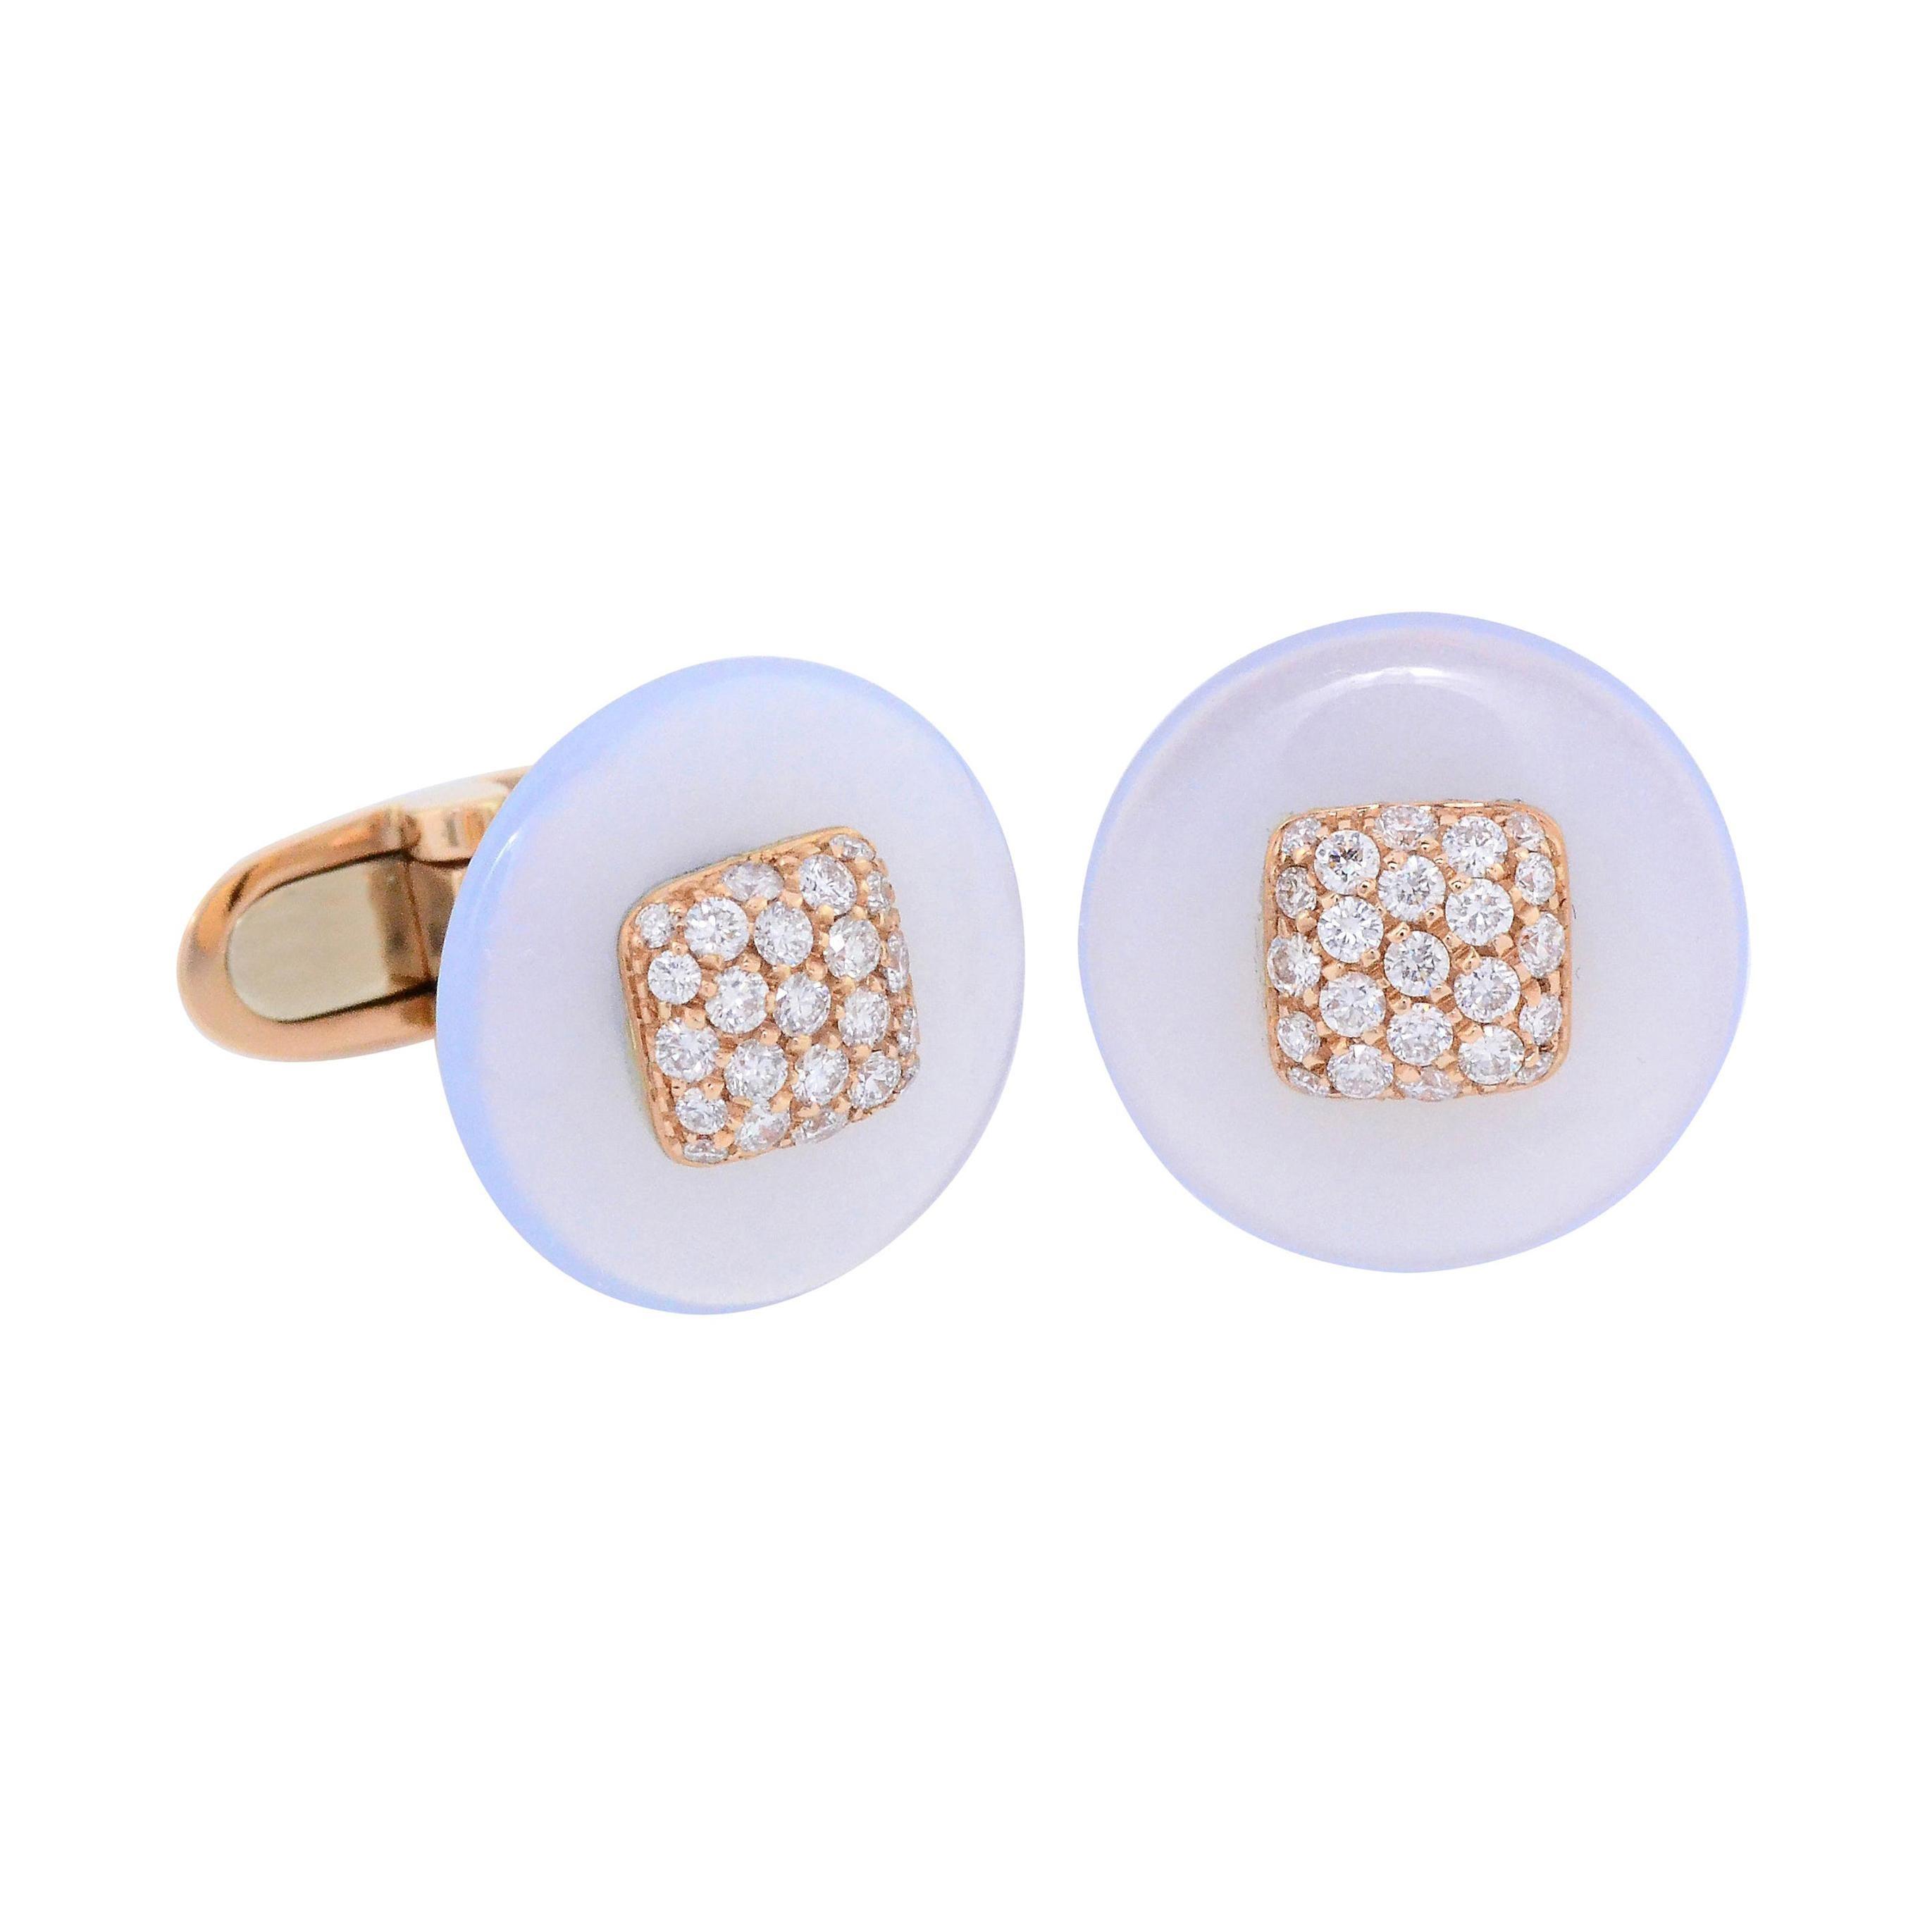 Fabric Cuffs and  Chalcedony Diamond 18 KT Rose Gold Cufflinks